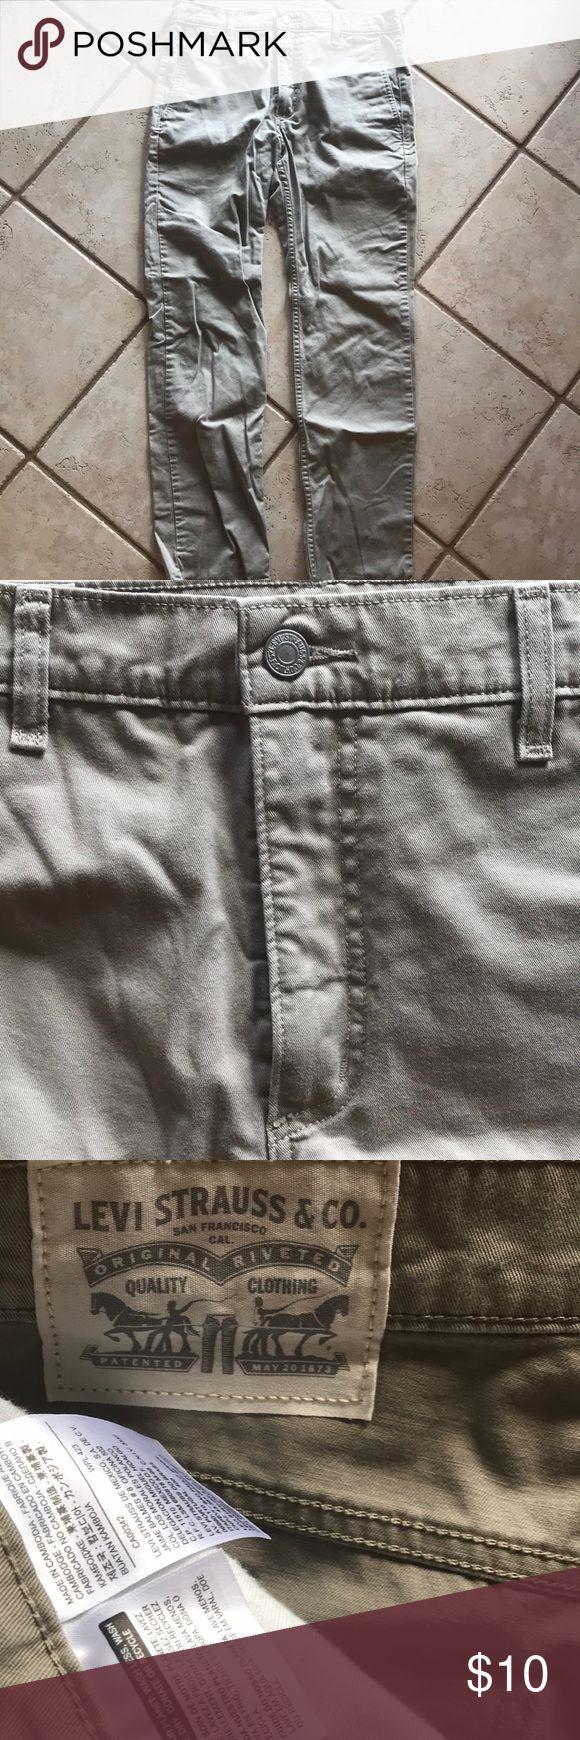 Levi's 511 Pants Levi's 511 Pants in khaki Levi's Pants Chinos & Khakis